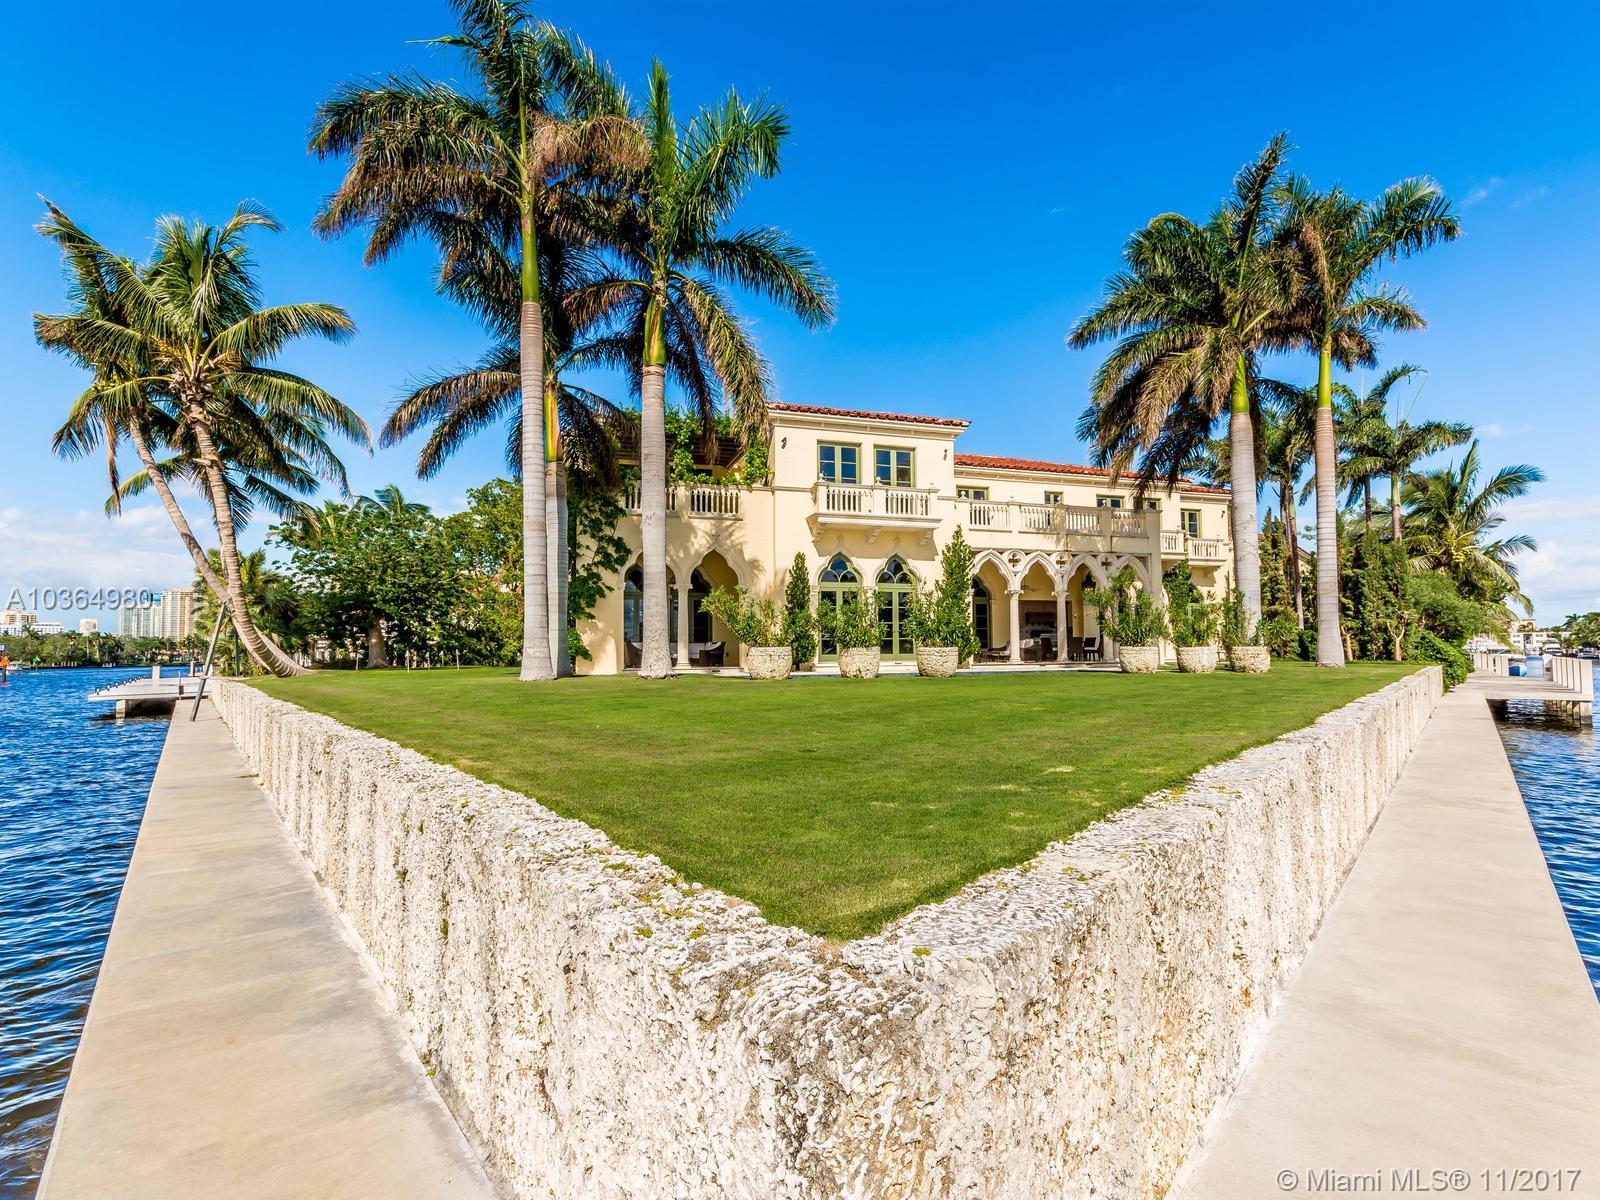 534 Bontona Ave, Fort Lauderdale FL, 33301